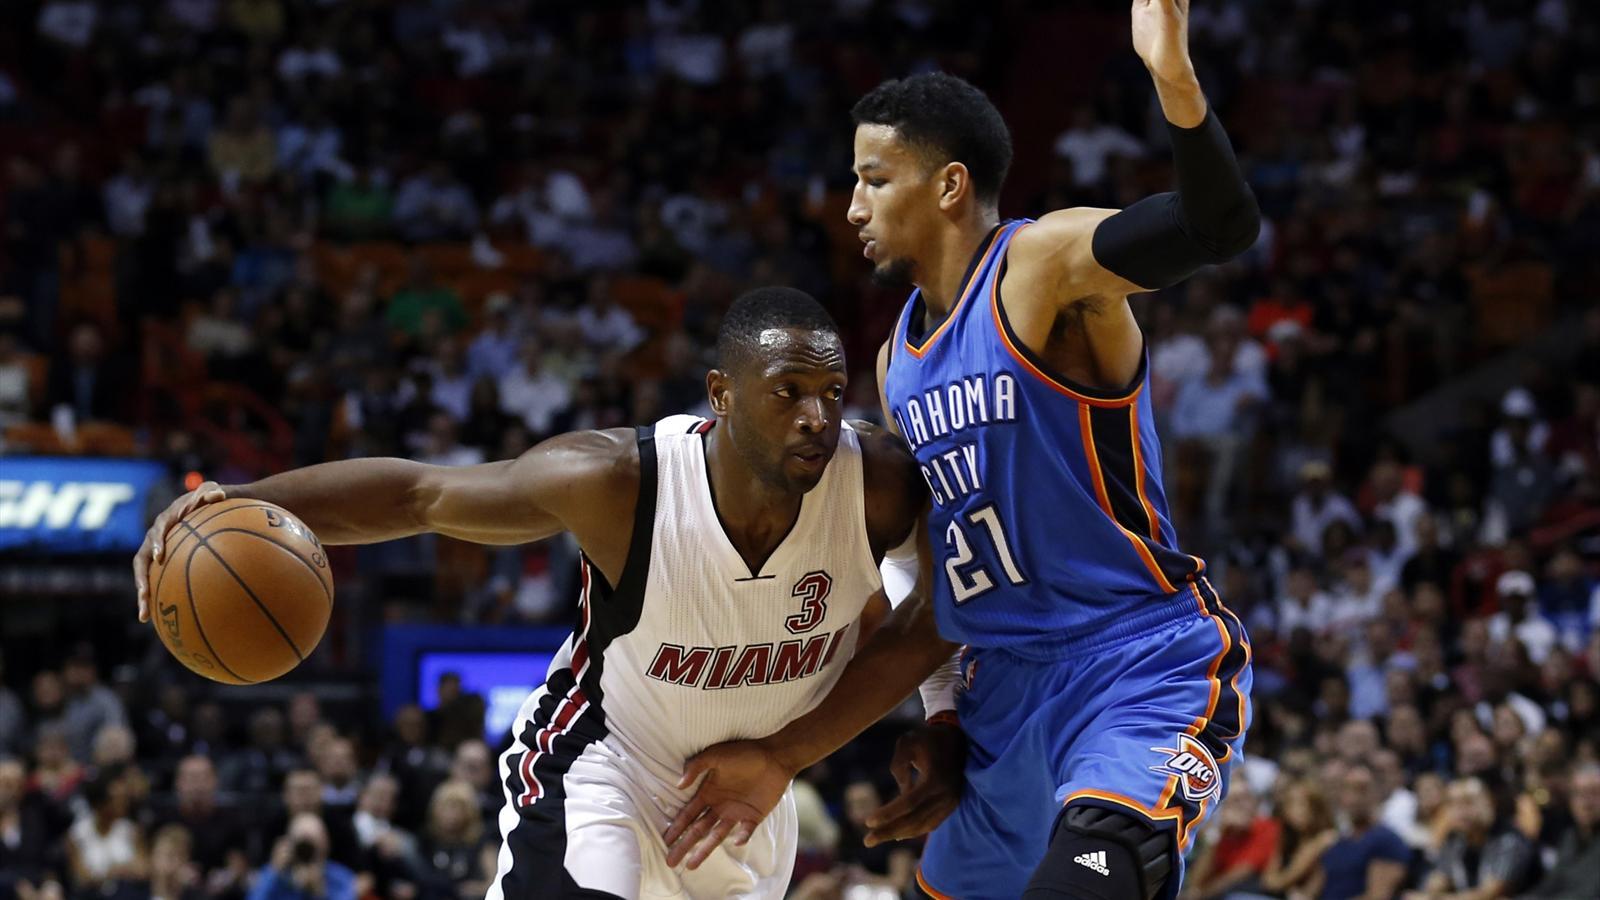 Dwyane Wade of the Miami Heat